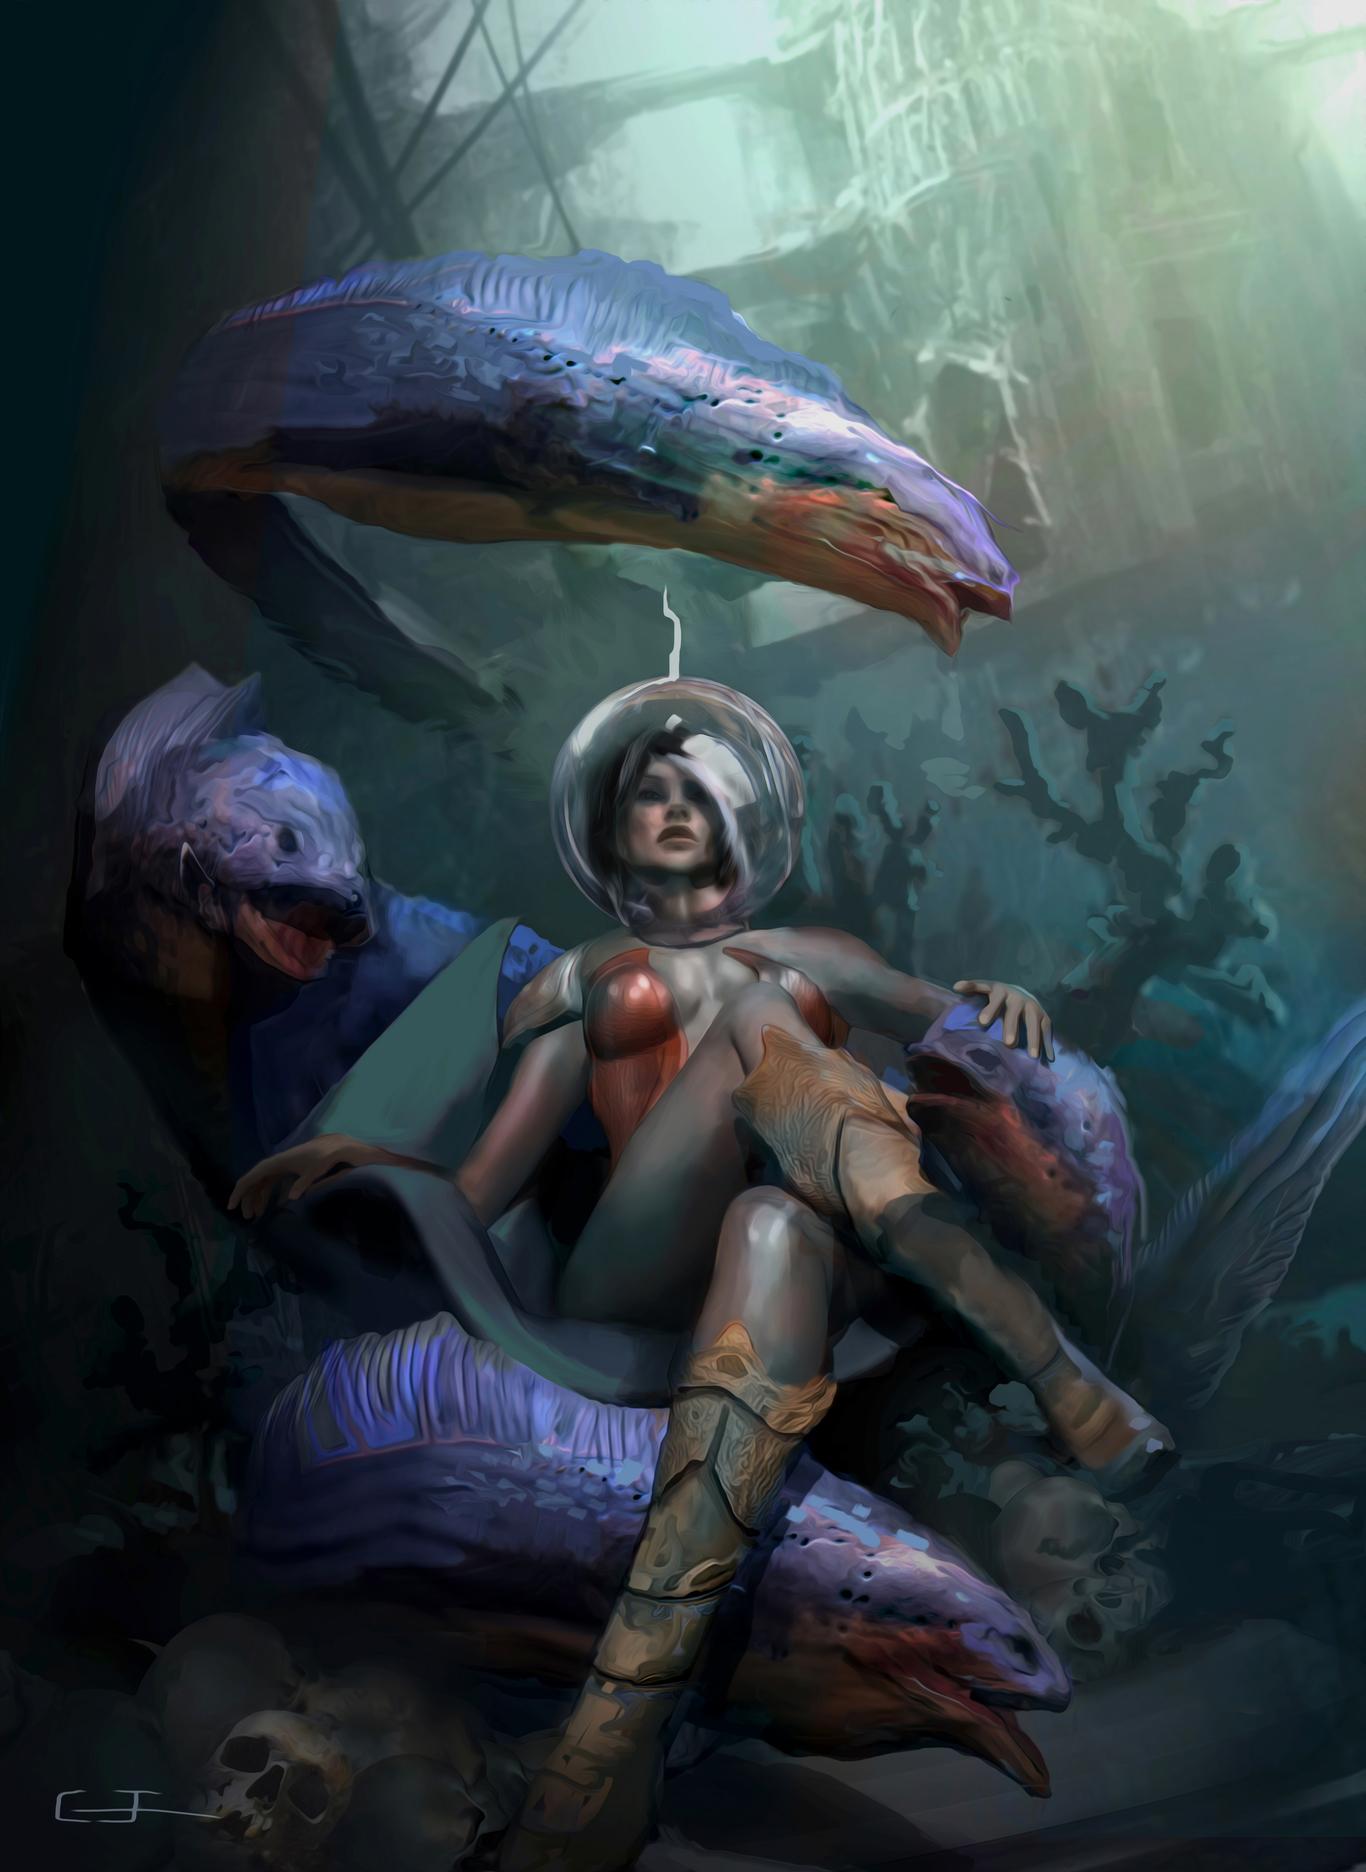 Wildcory1 eel woman concept ar 1 9c9ed354 0d0z